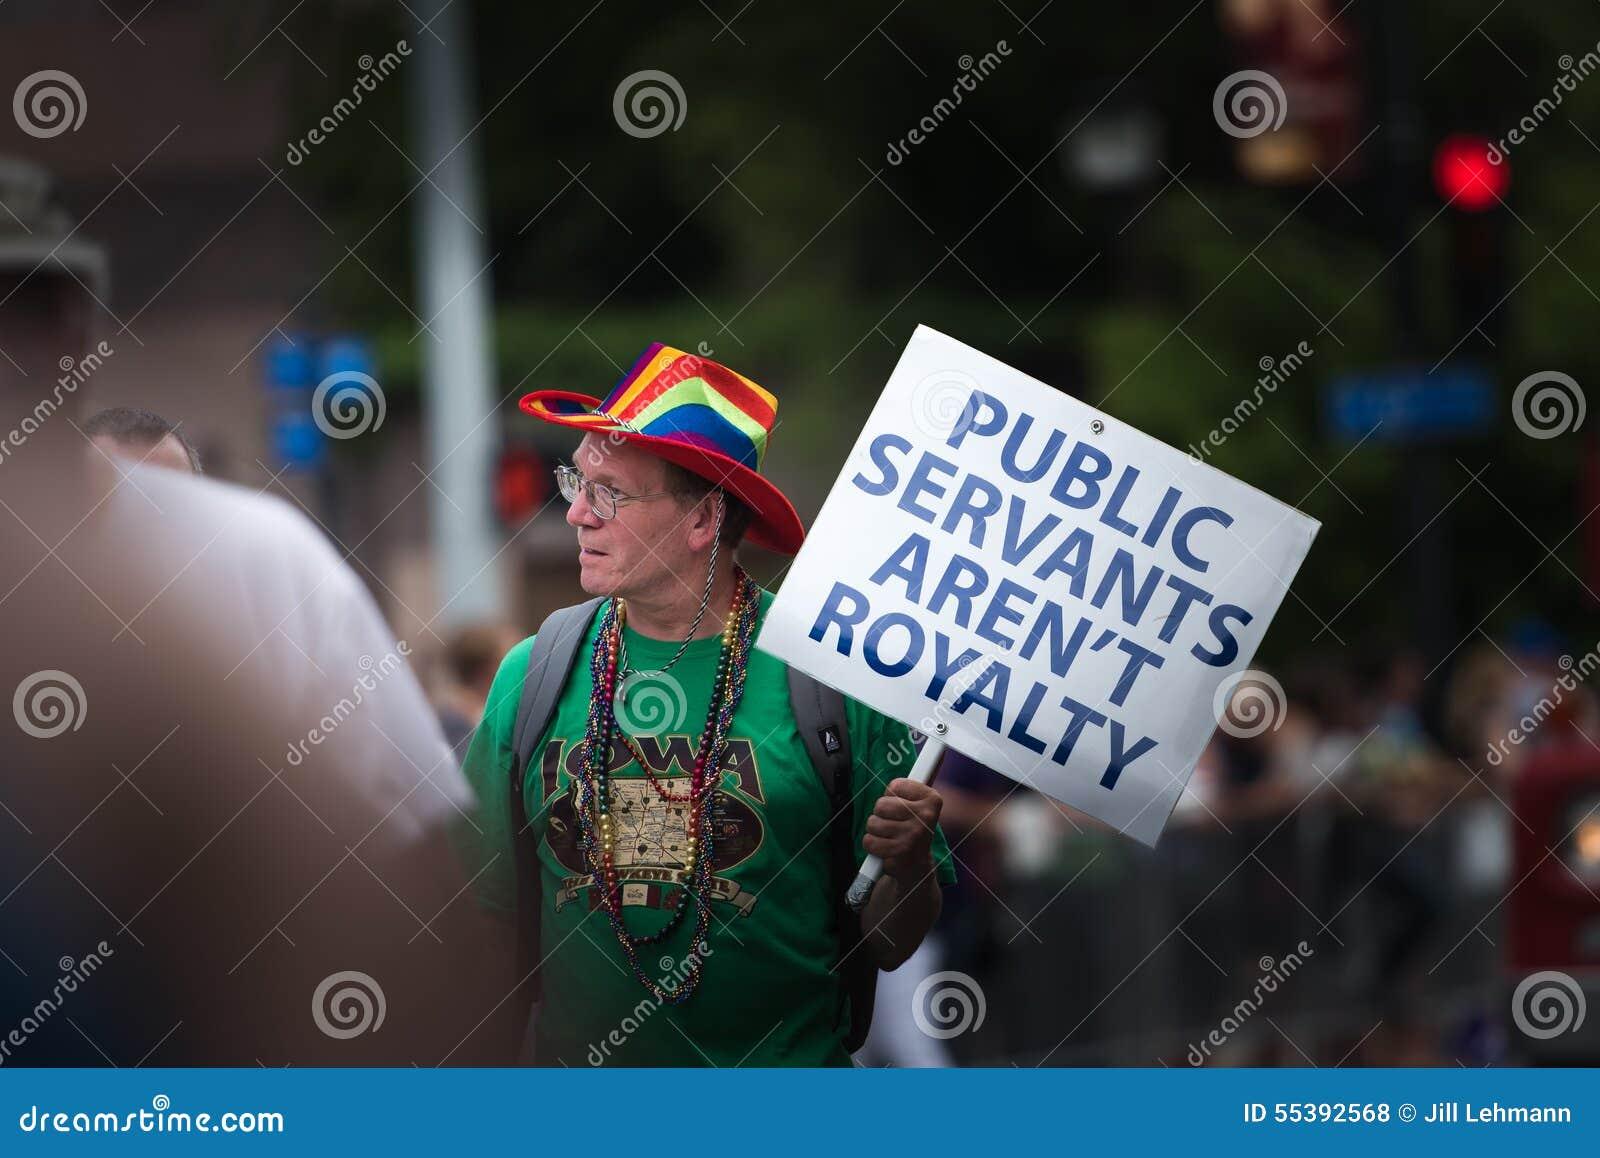 gay stranger